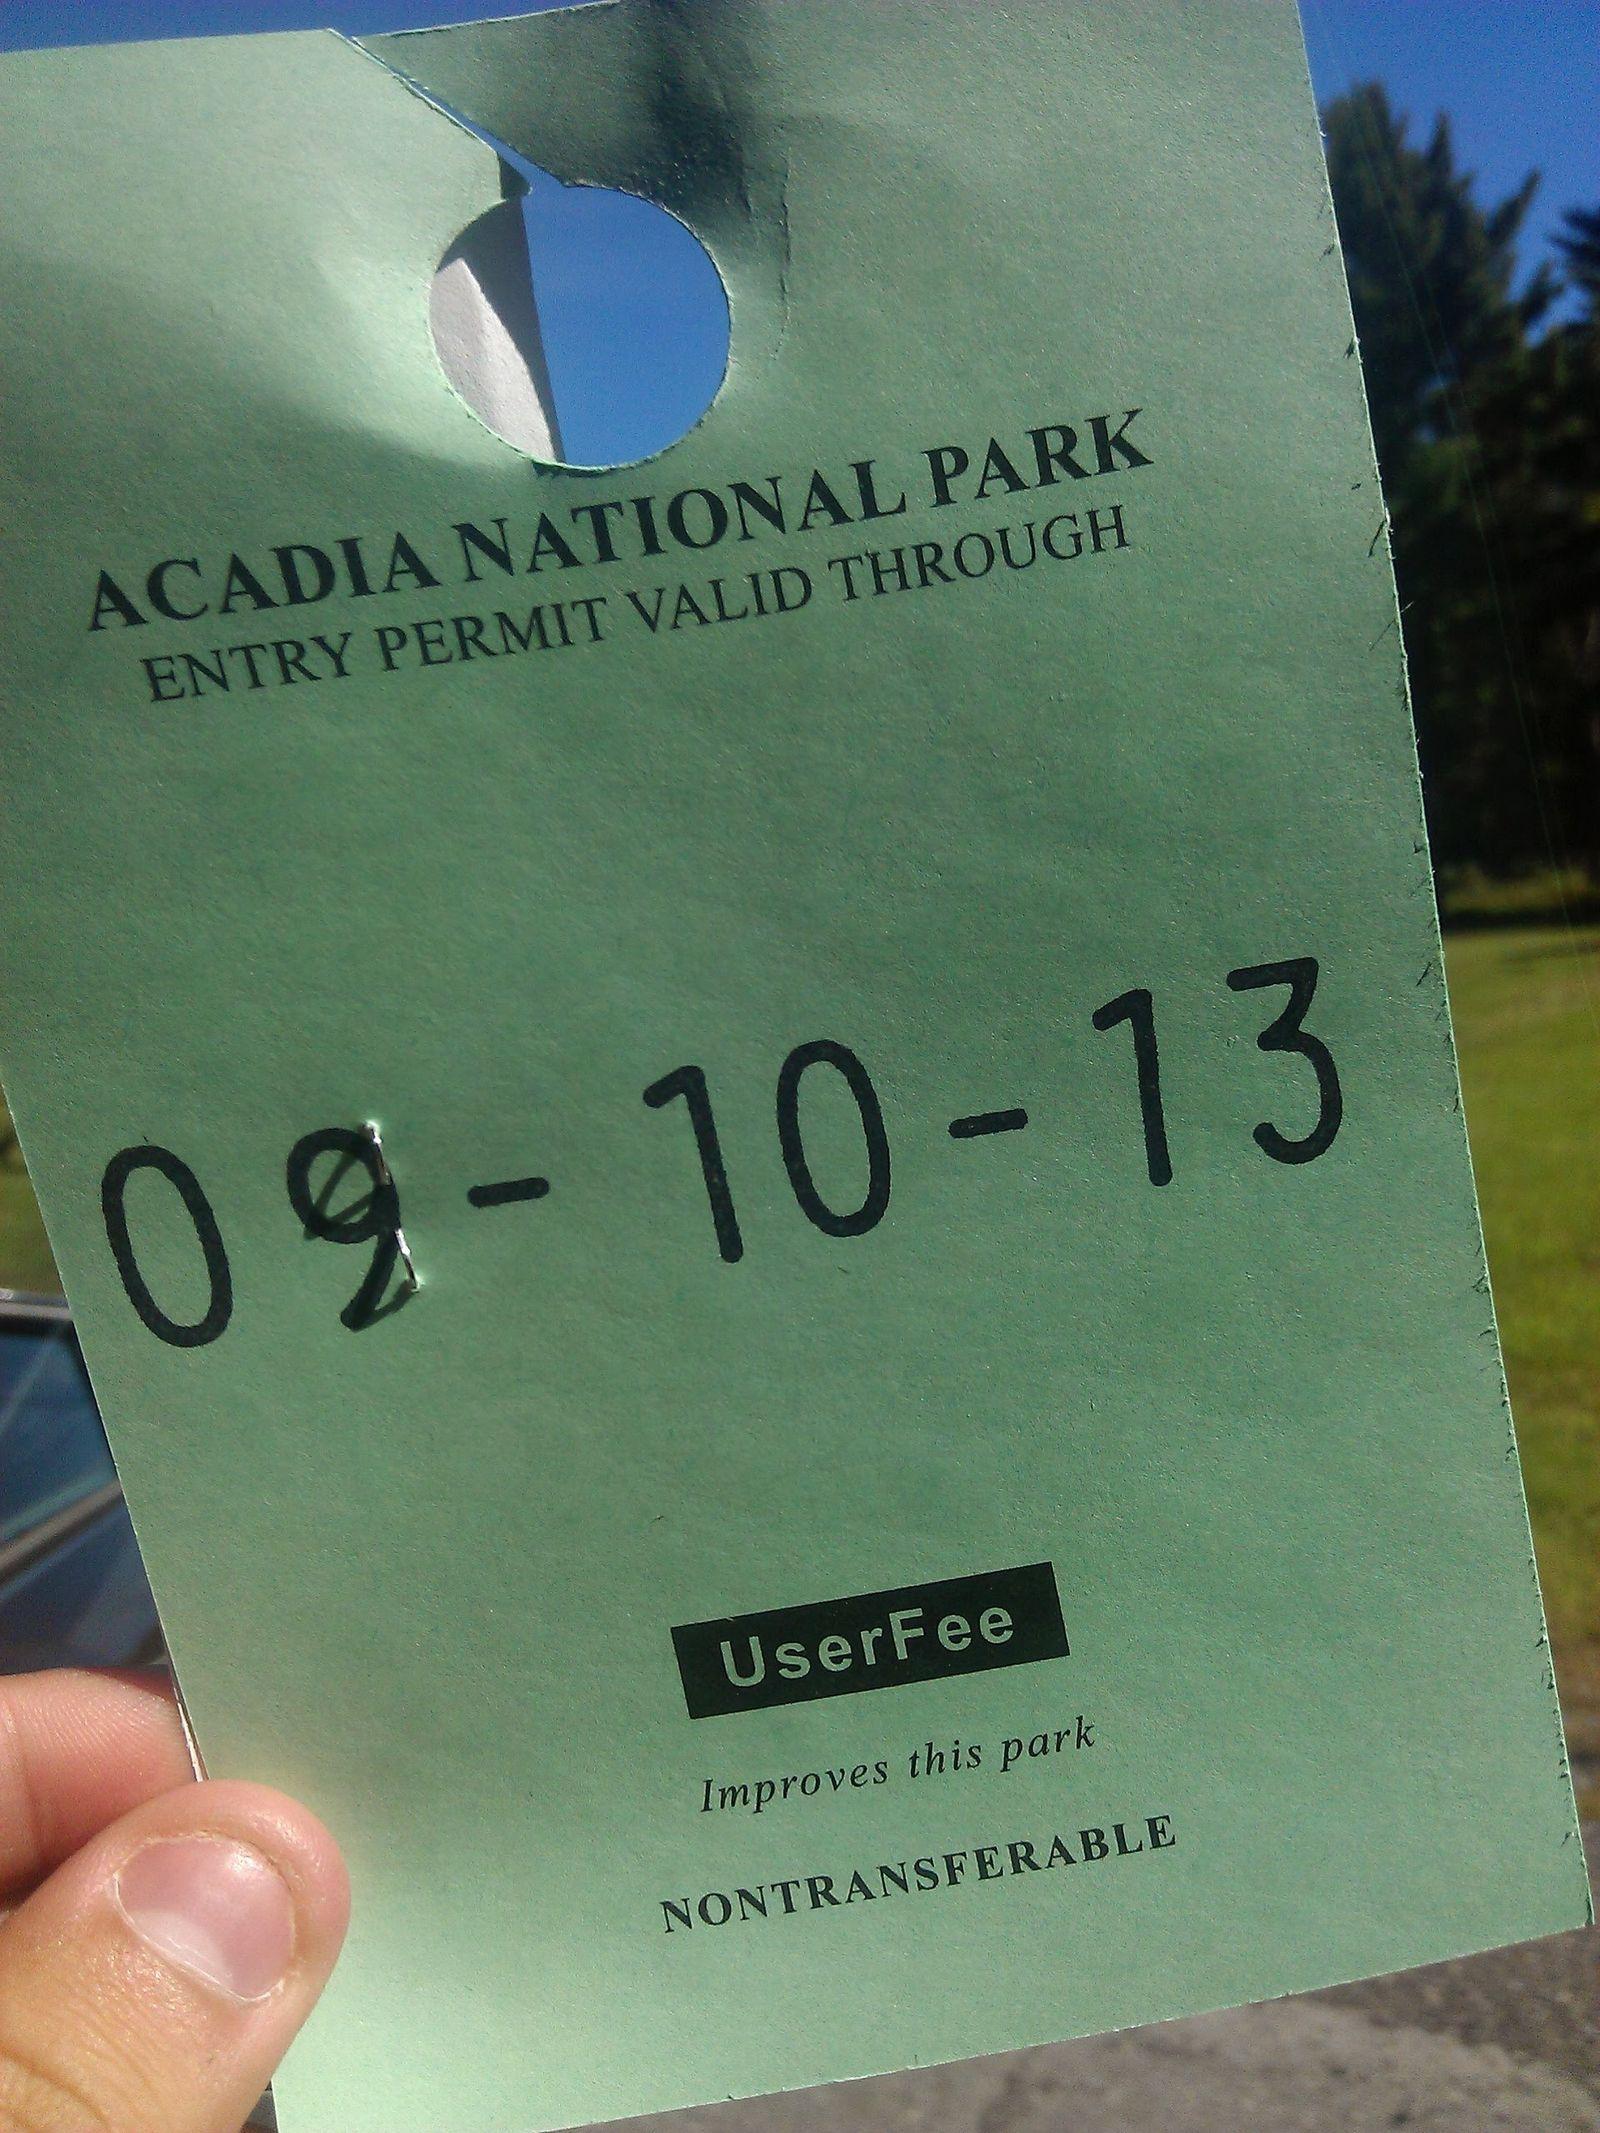 Hasta la próxima, Acadia